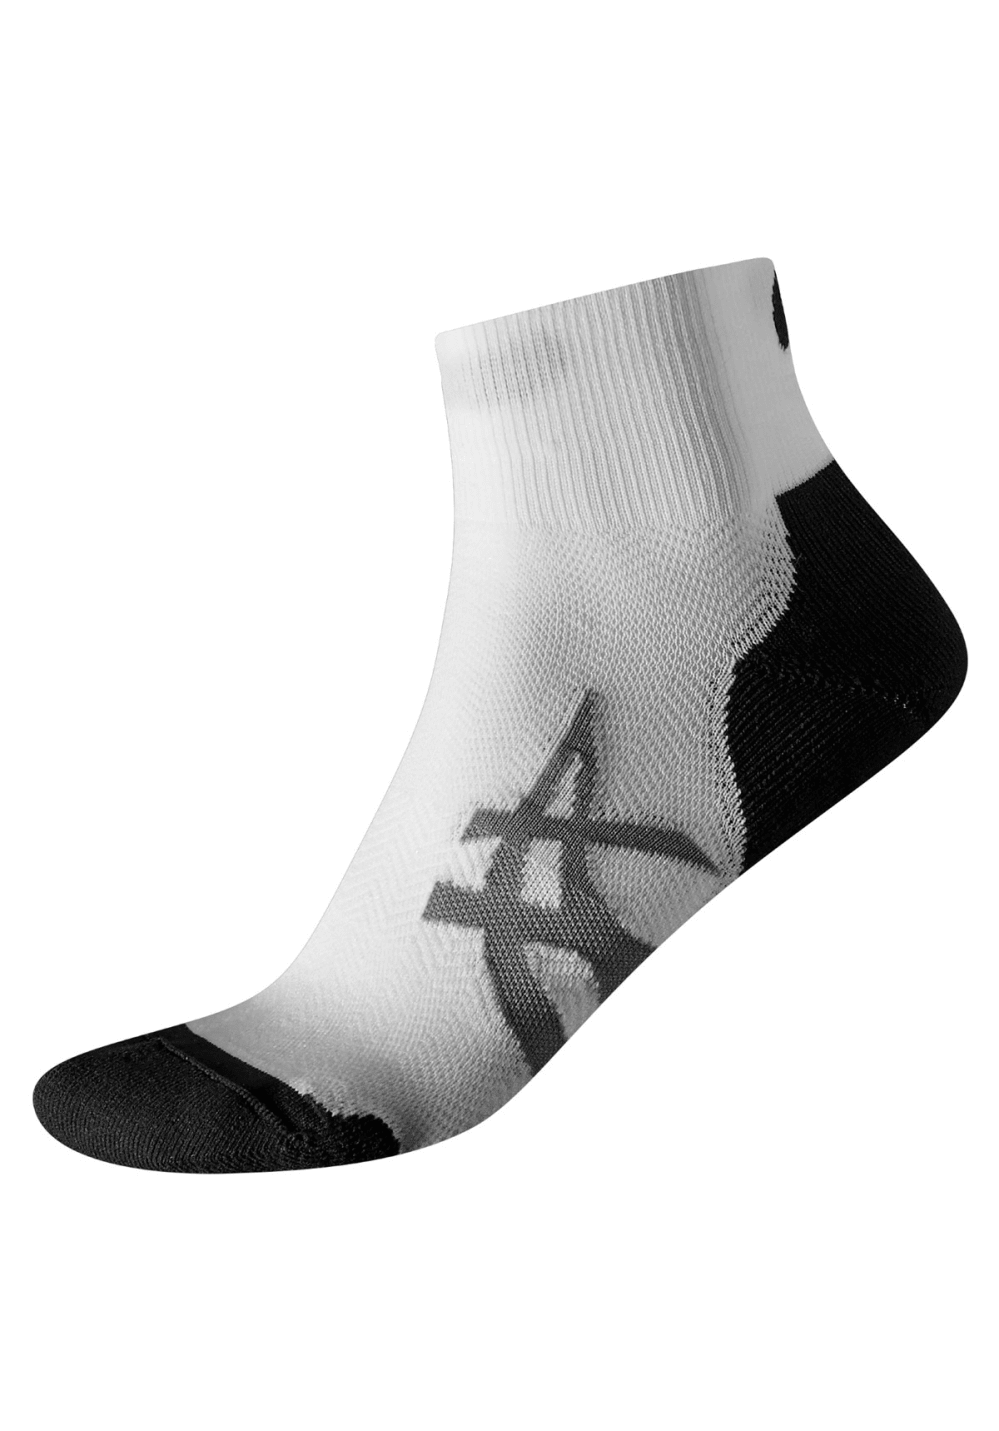 ASICS 2Ppk Cushioning Sock Laufsocken - Weiß